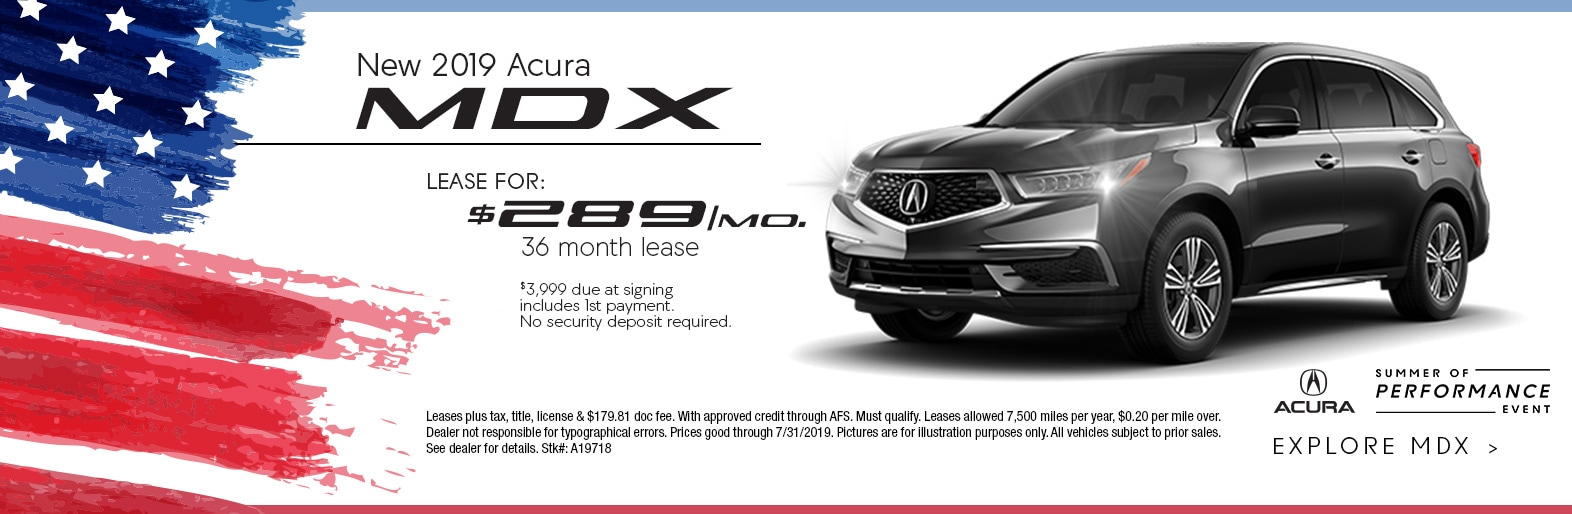 Acura Mdx Lease >> New 2019 Acura Mdx Suv Lease Deal Ed Napleton Acura